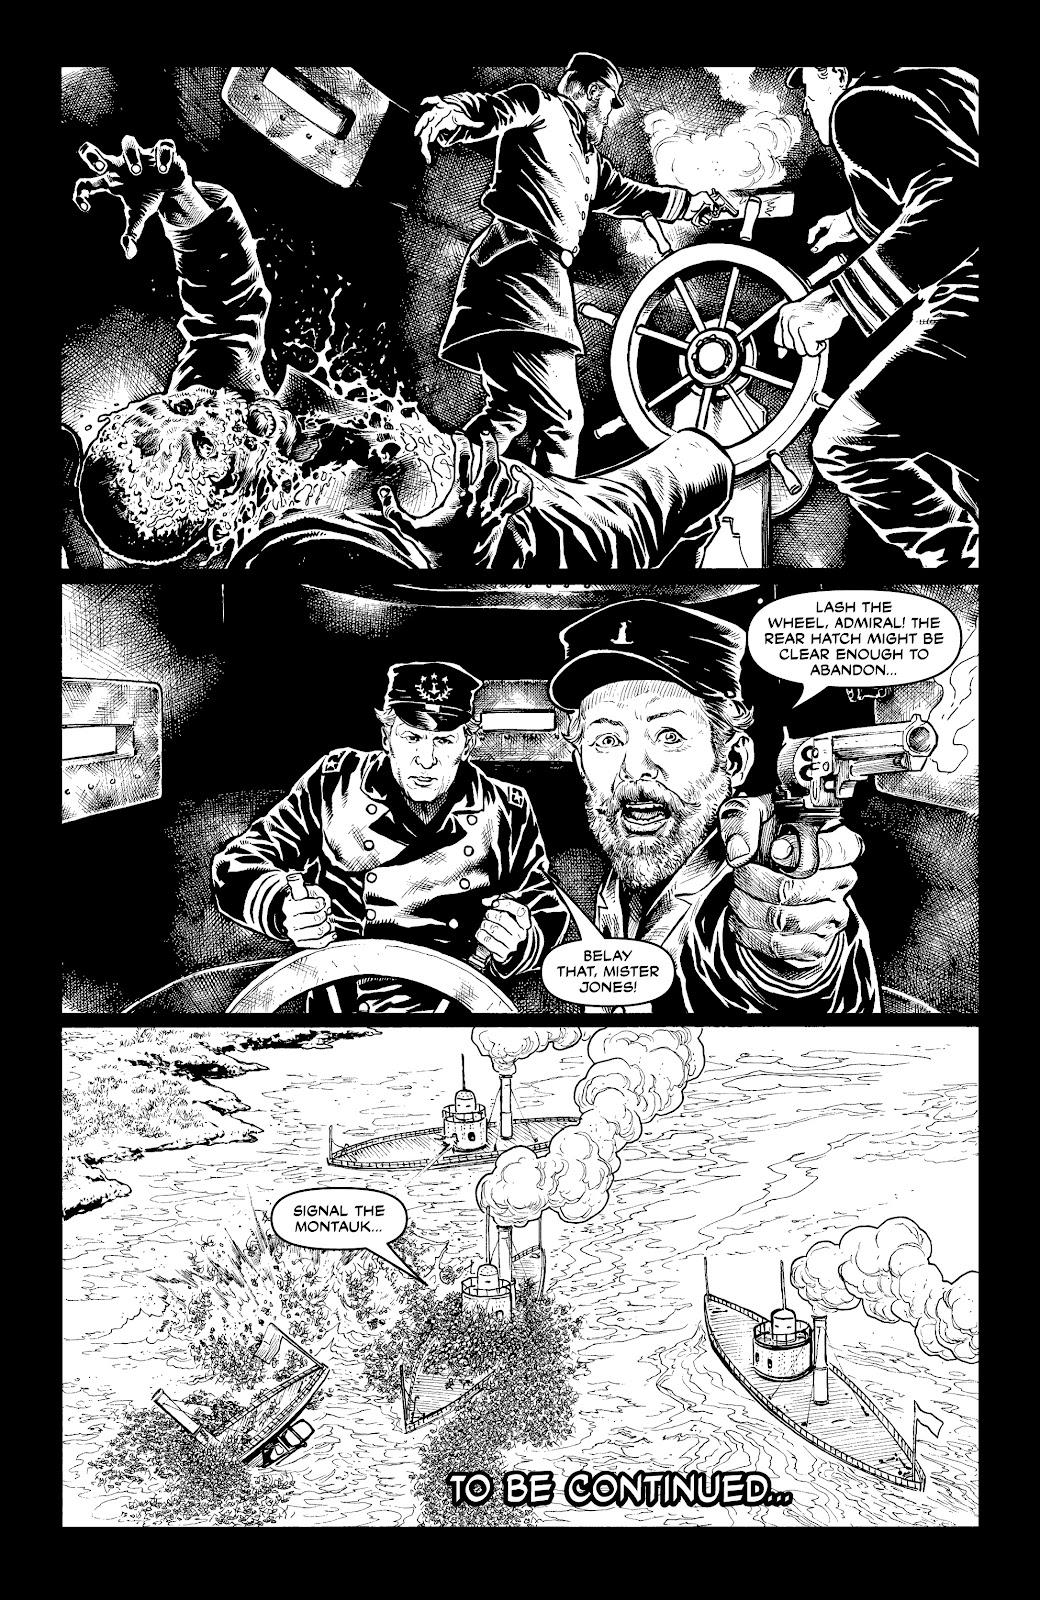 Read online Alan Moore's Cinema Purgatorio comic -  Issue #17 - 42